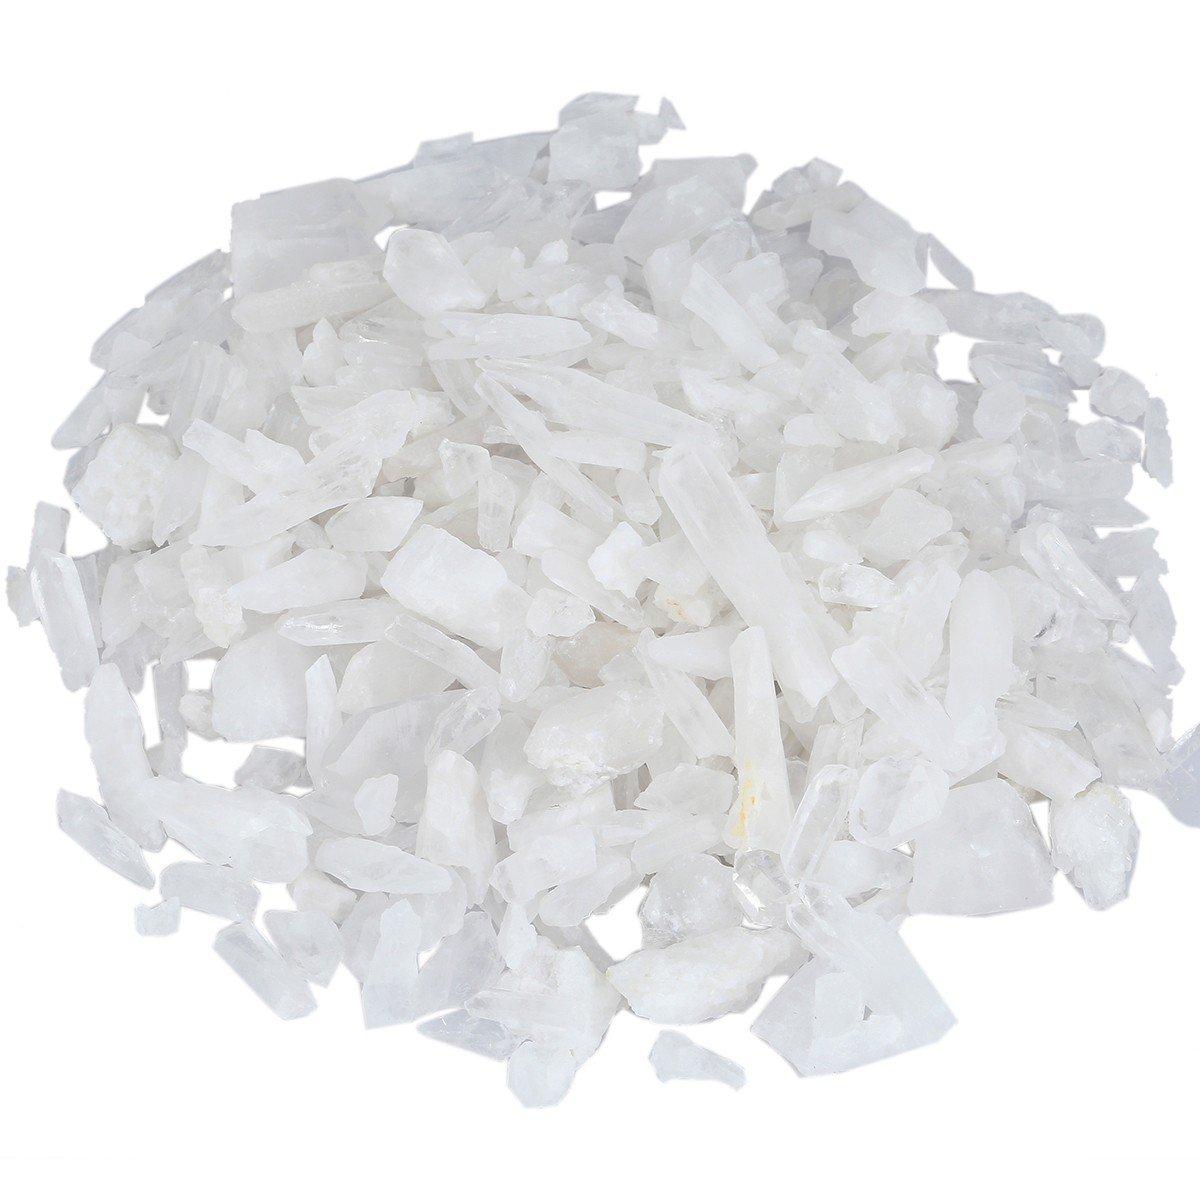 rockcloud 1/2 lb Irregular Raw Natural Rock Quartz Stone Chips Crystal Specimen